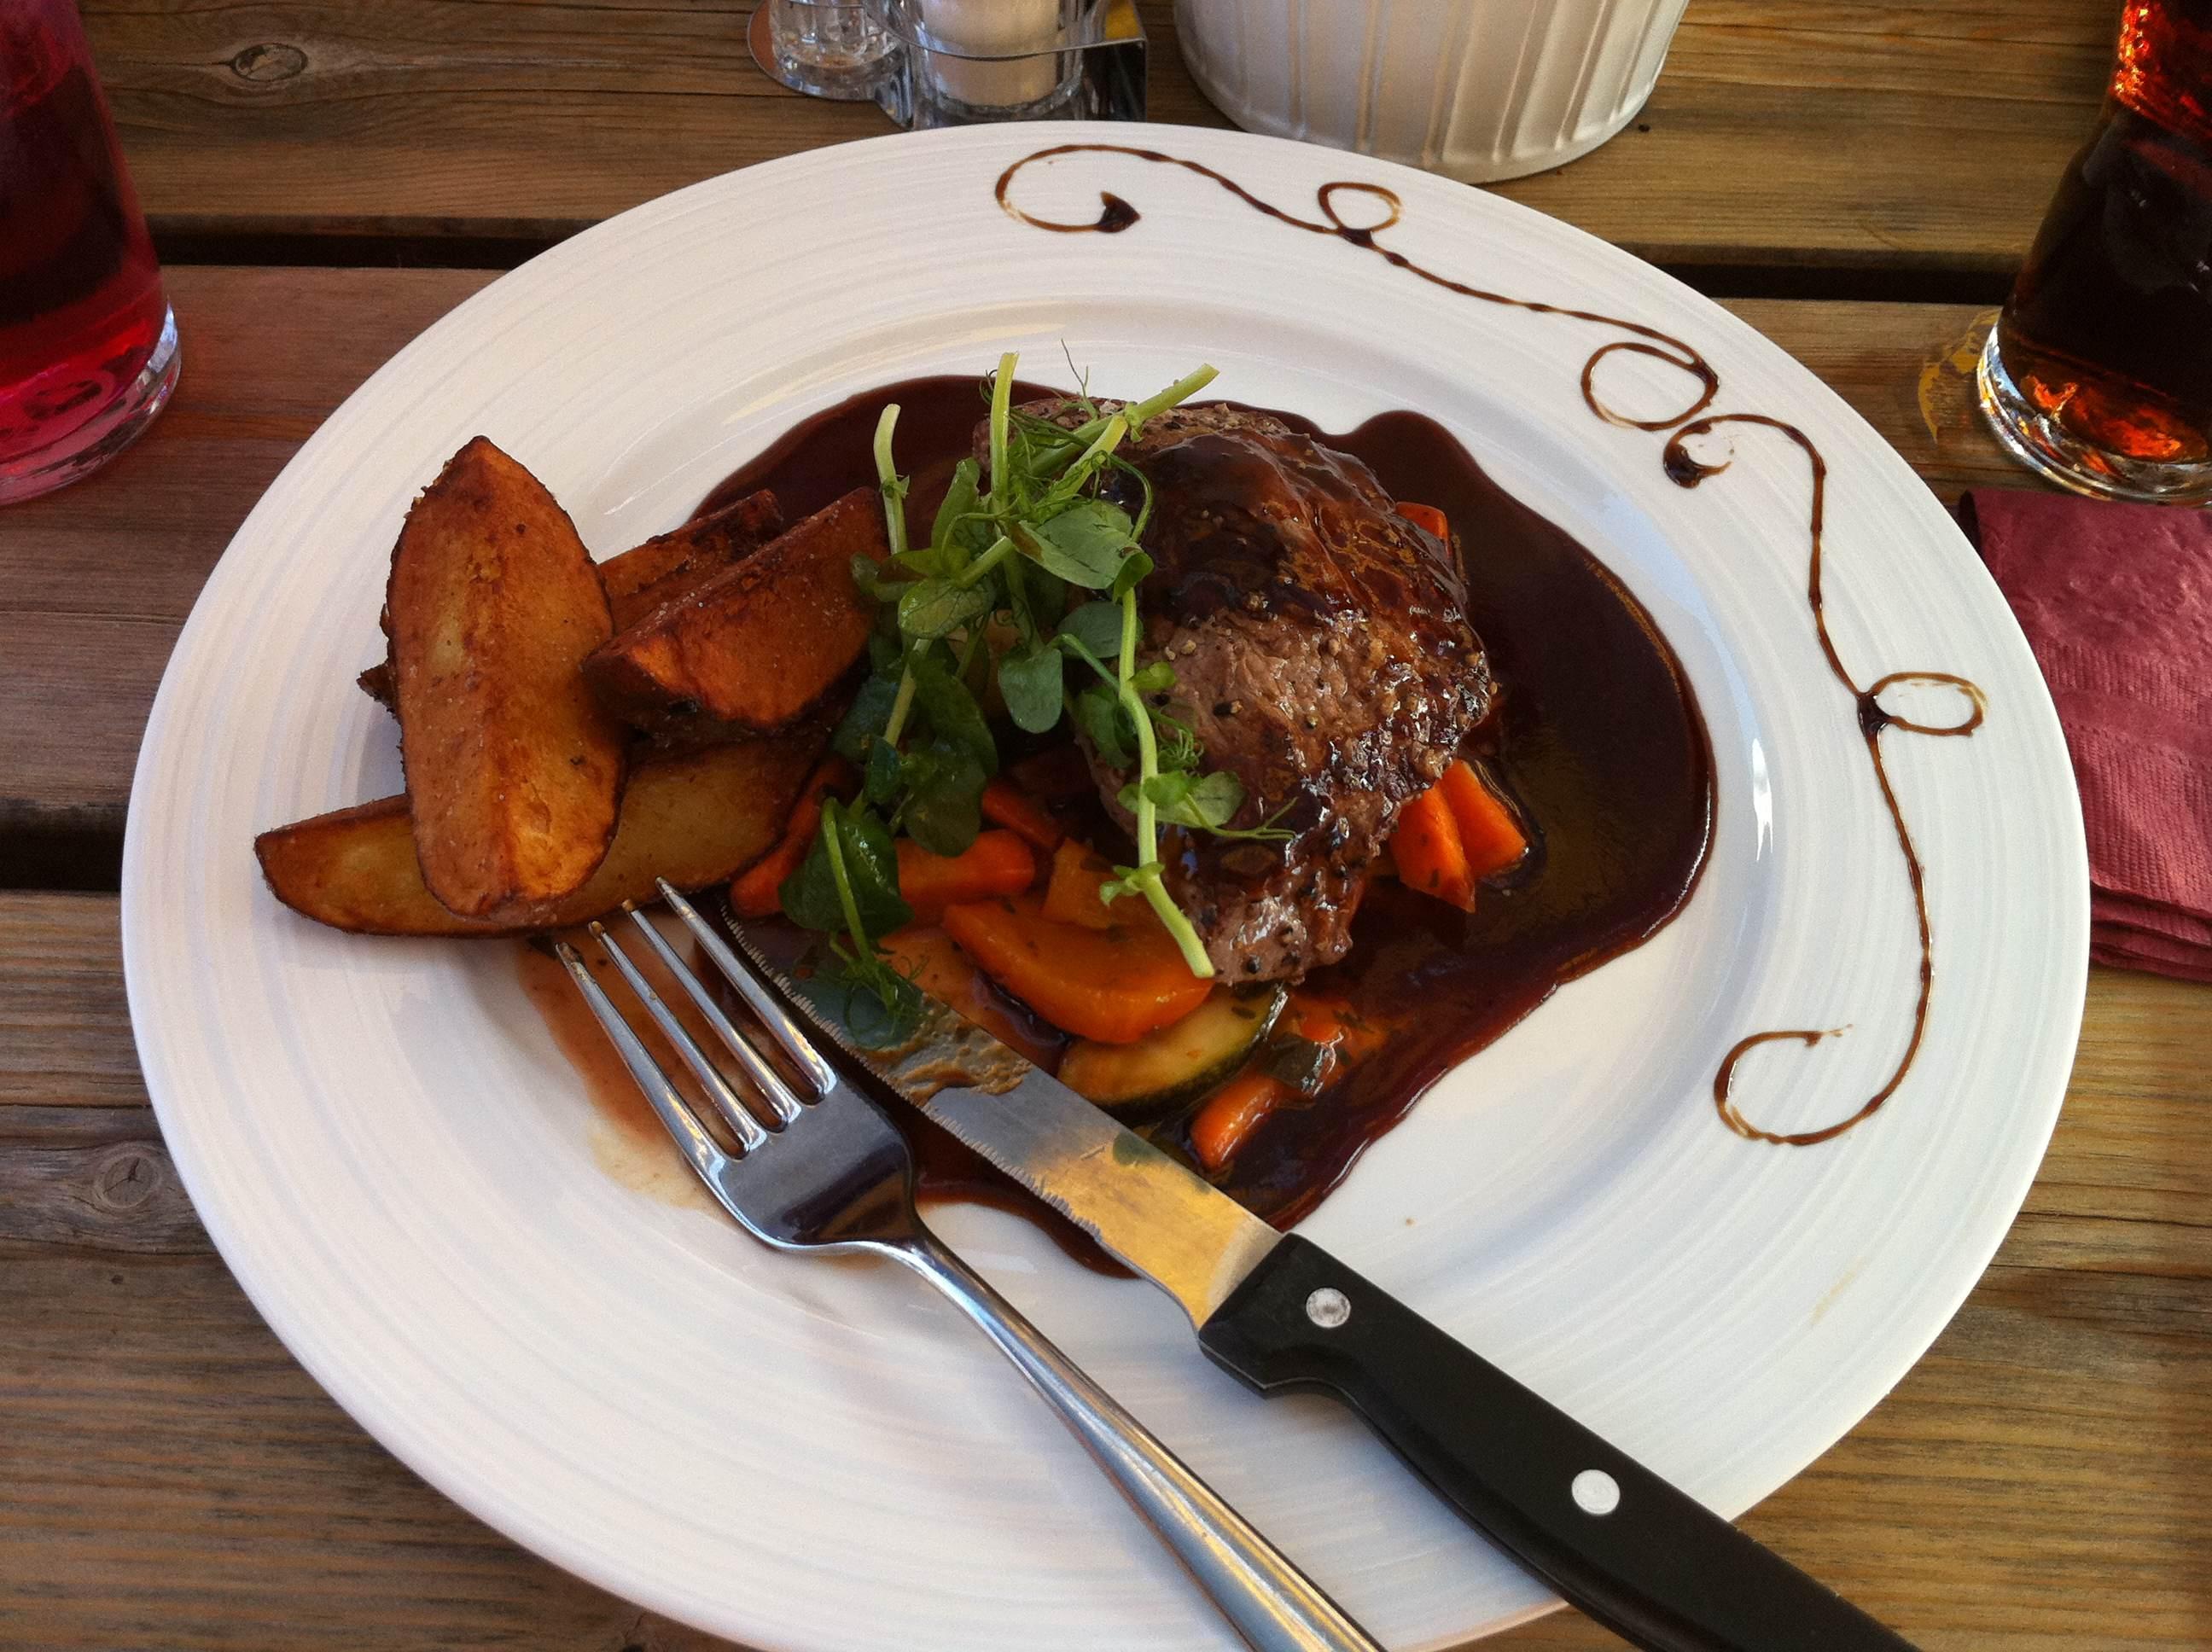 Restaurant Buffalo & Guestharbor, Korppoo